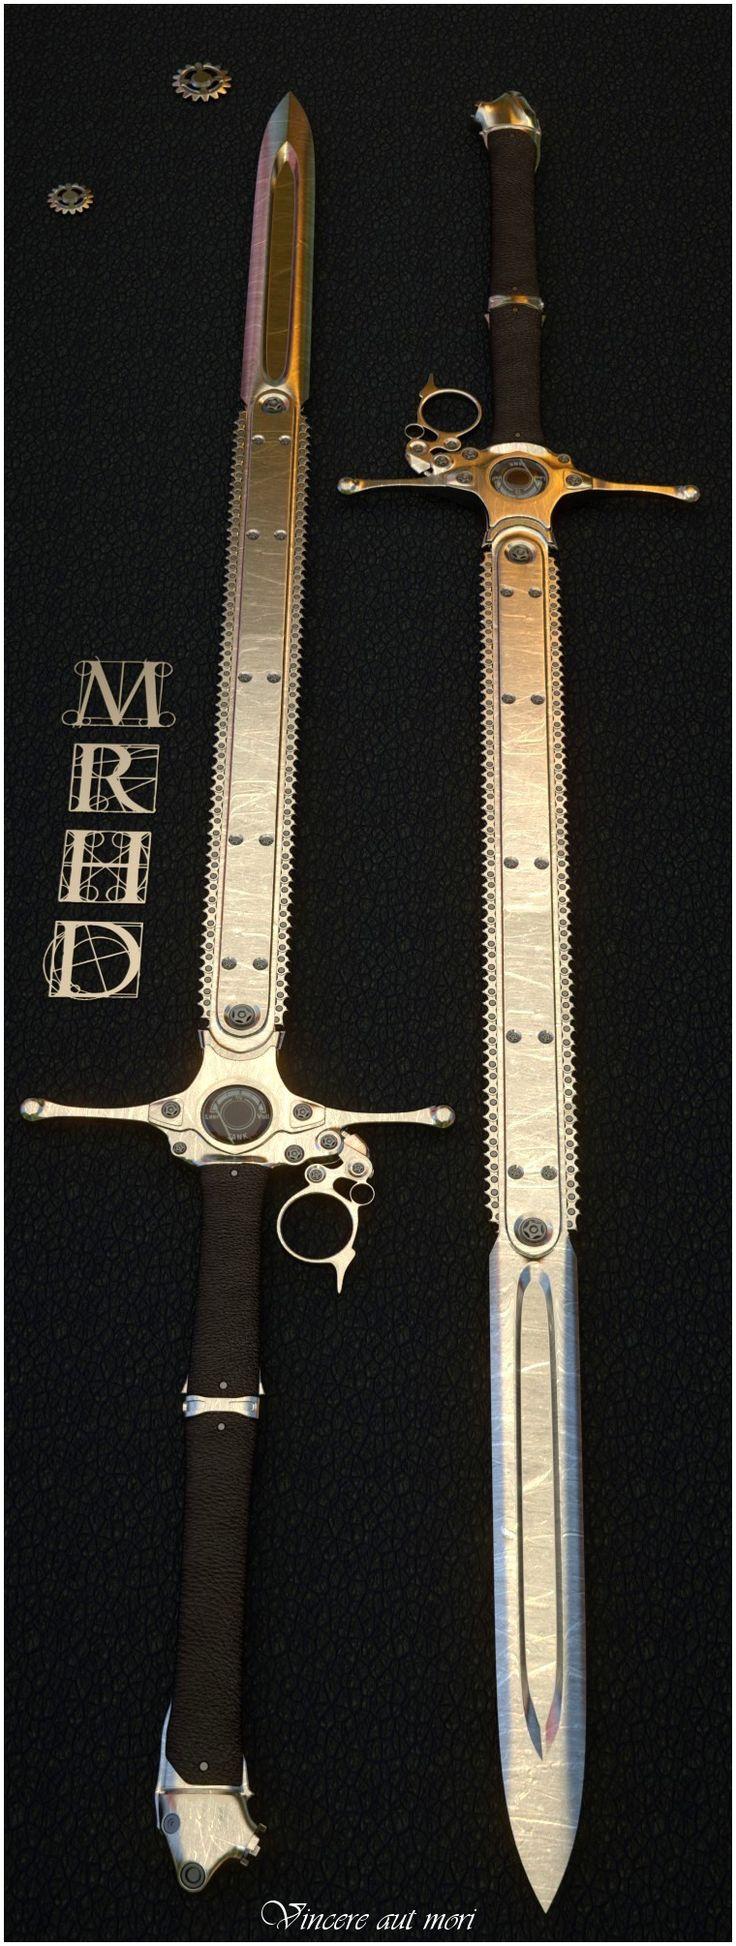 Chain-sword by mrhd.deviantart.com on @deviantART